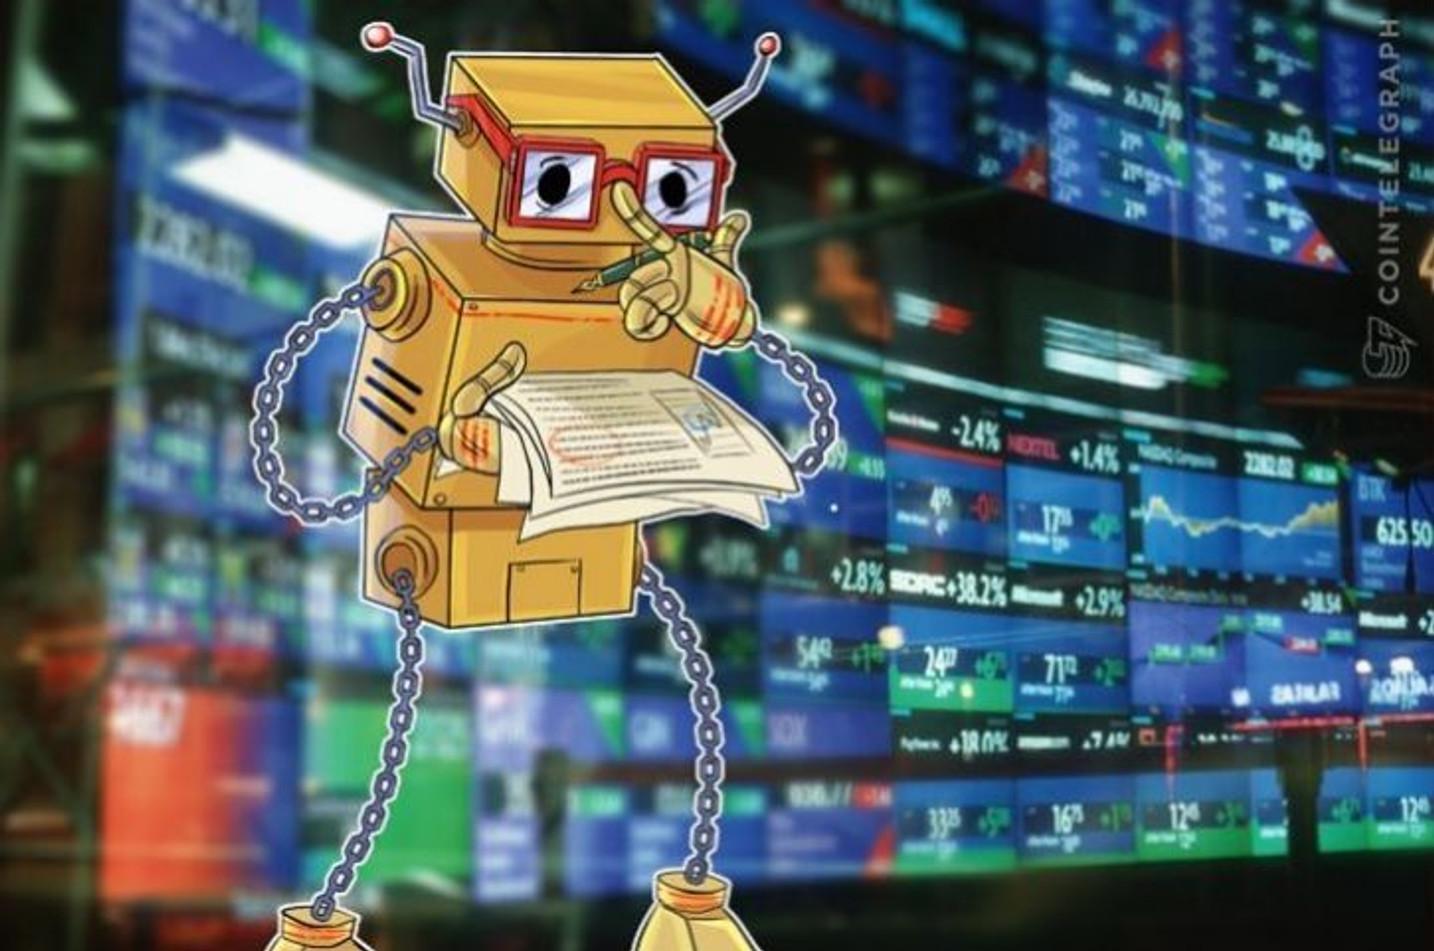 Xerox aplicará patente de Blockchain con sello de tiempo